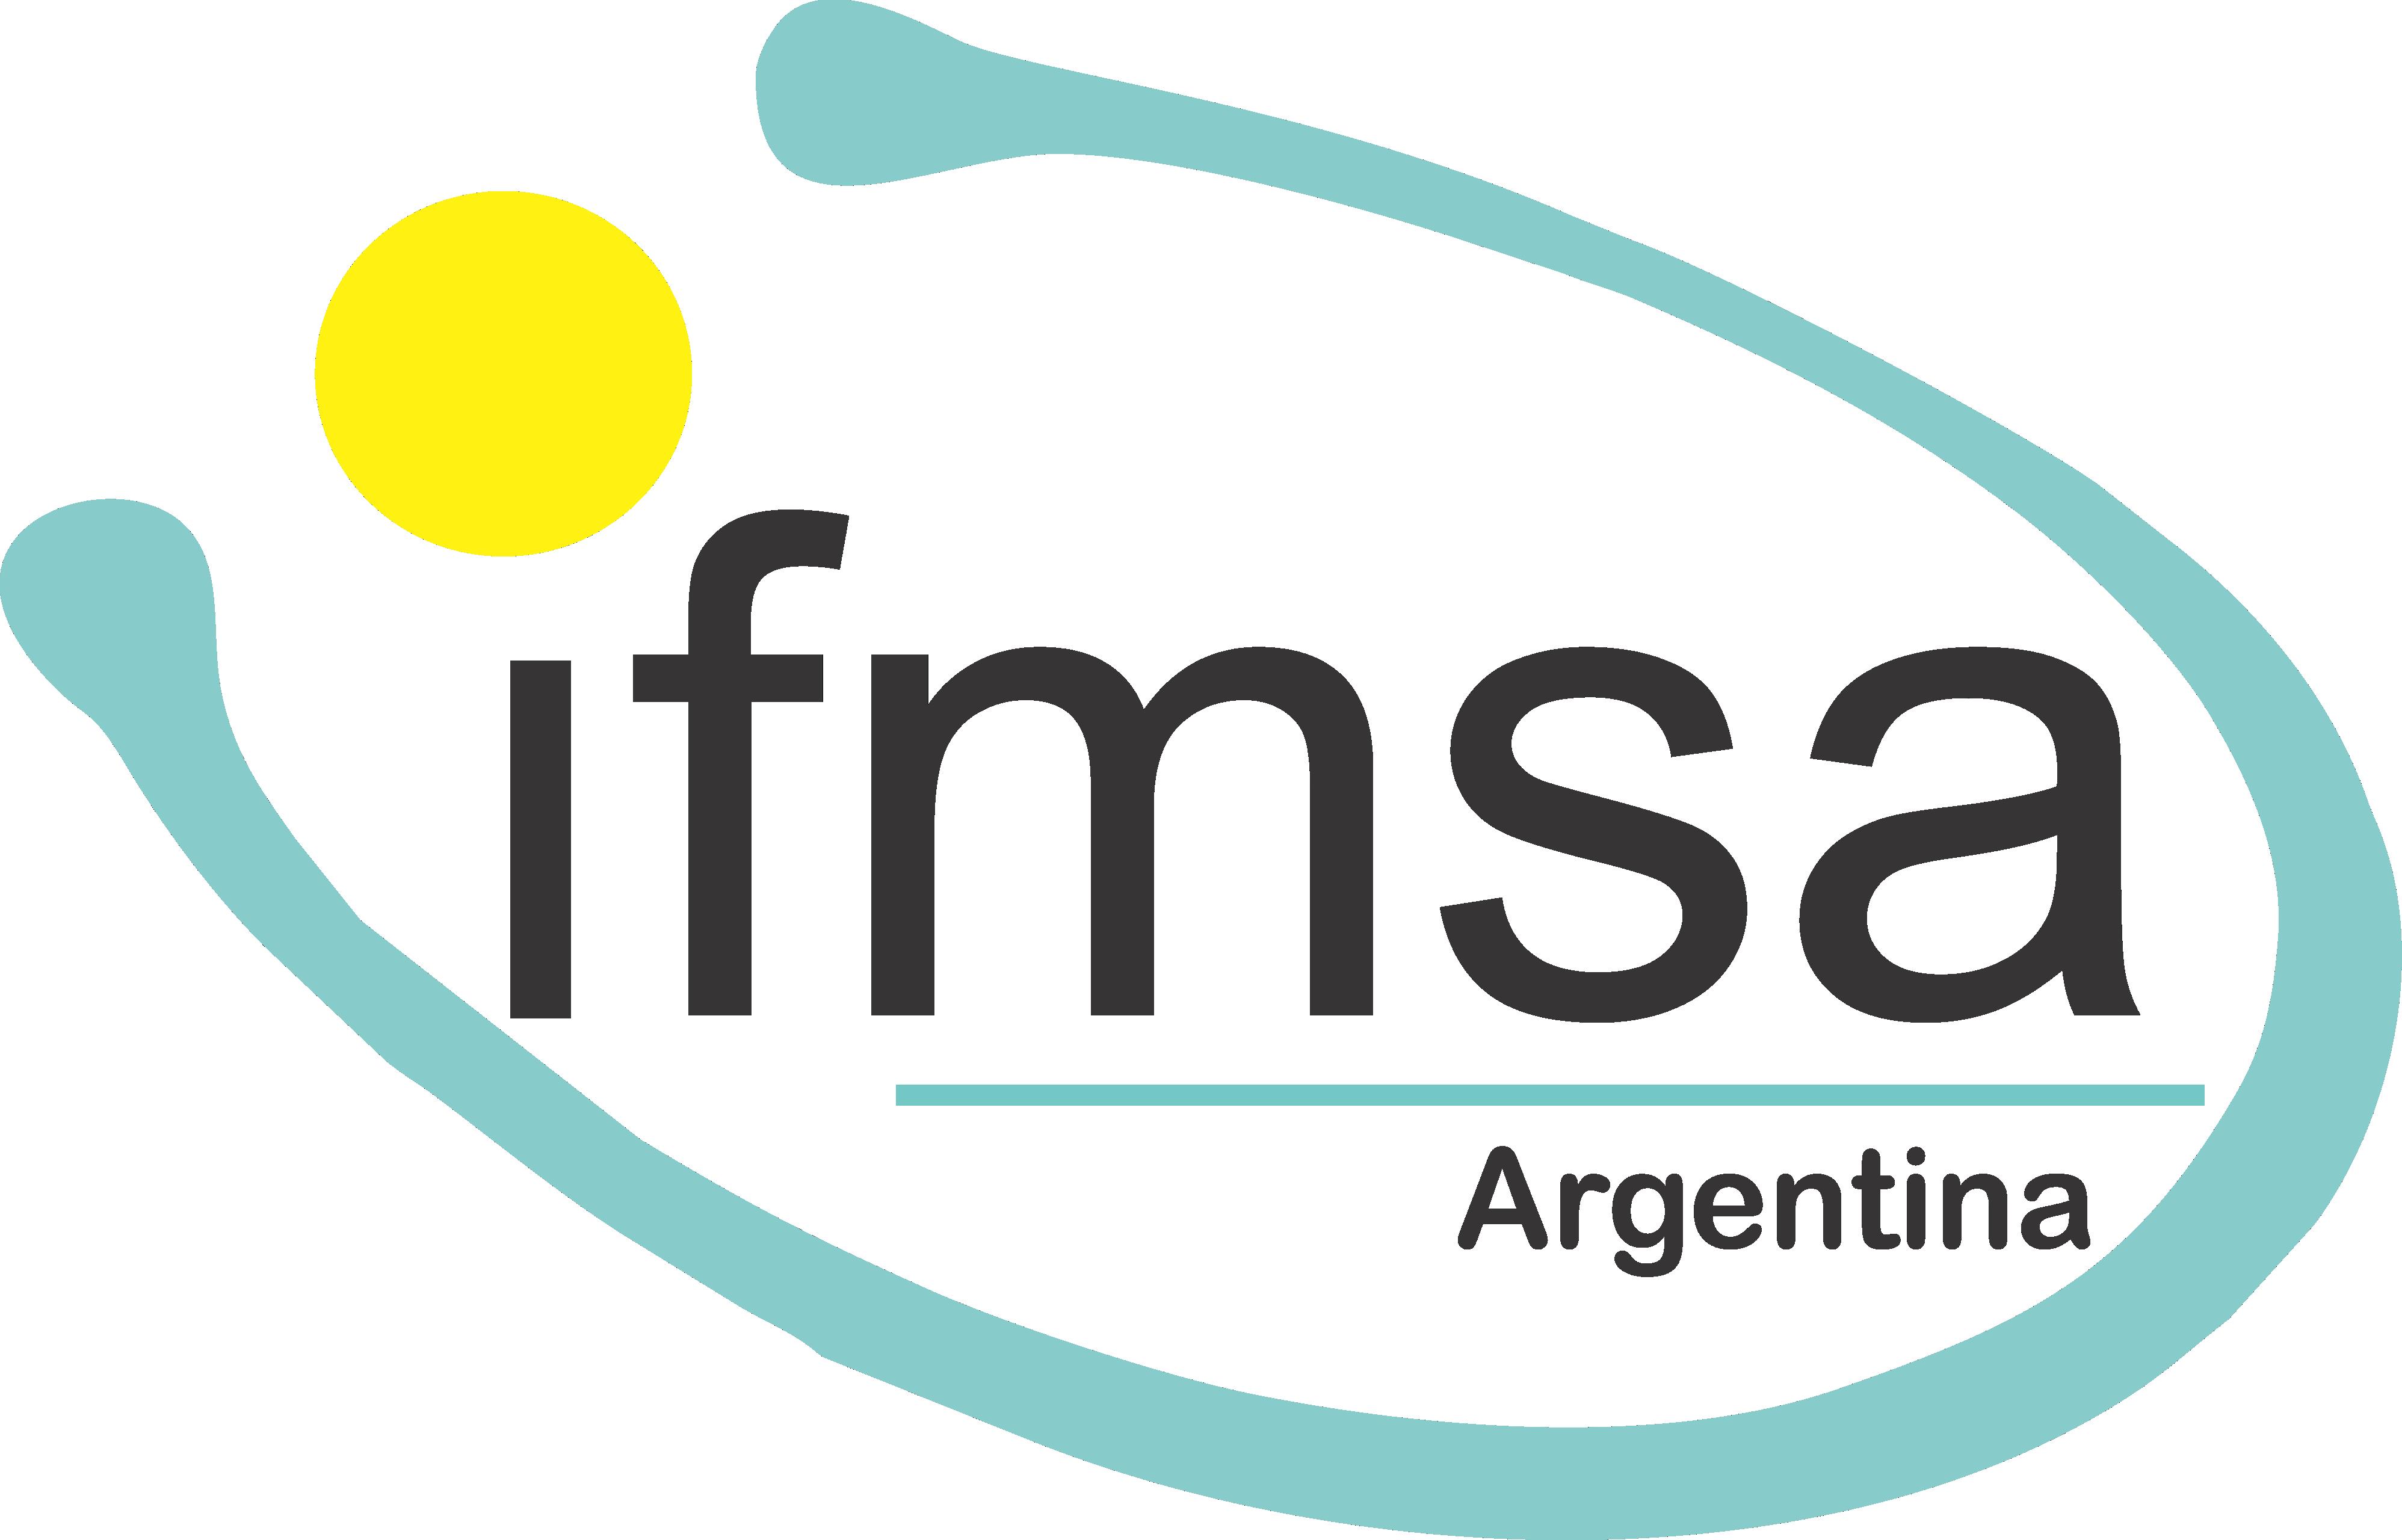 IFMSA – Argentina